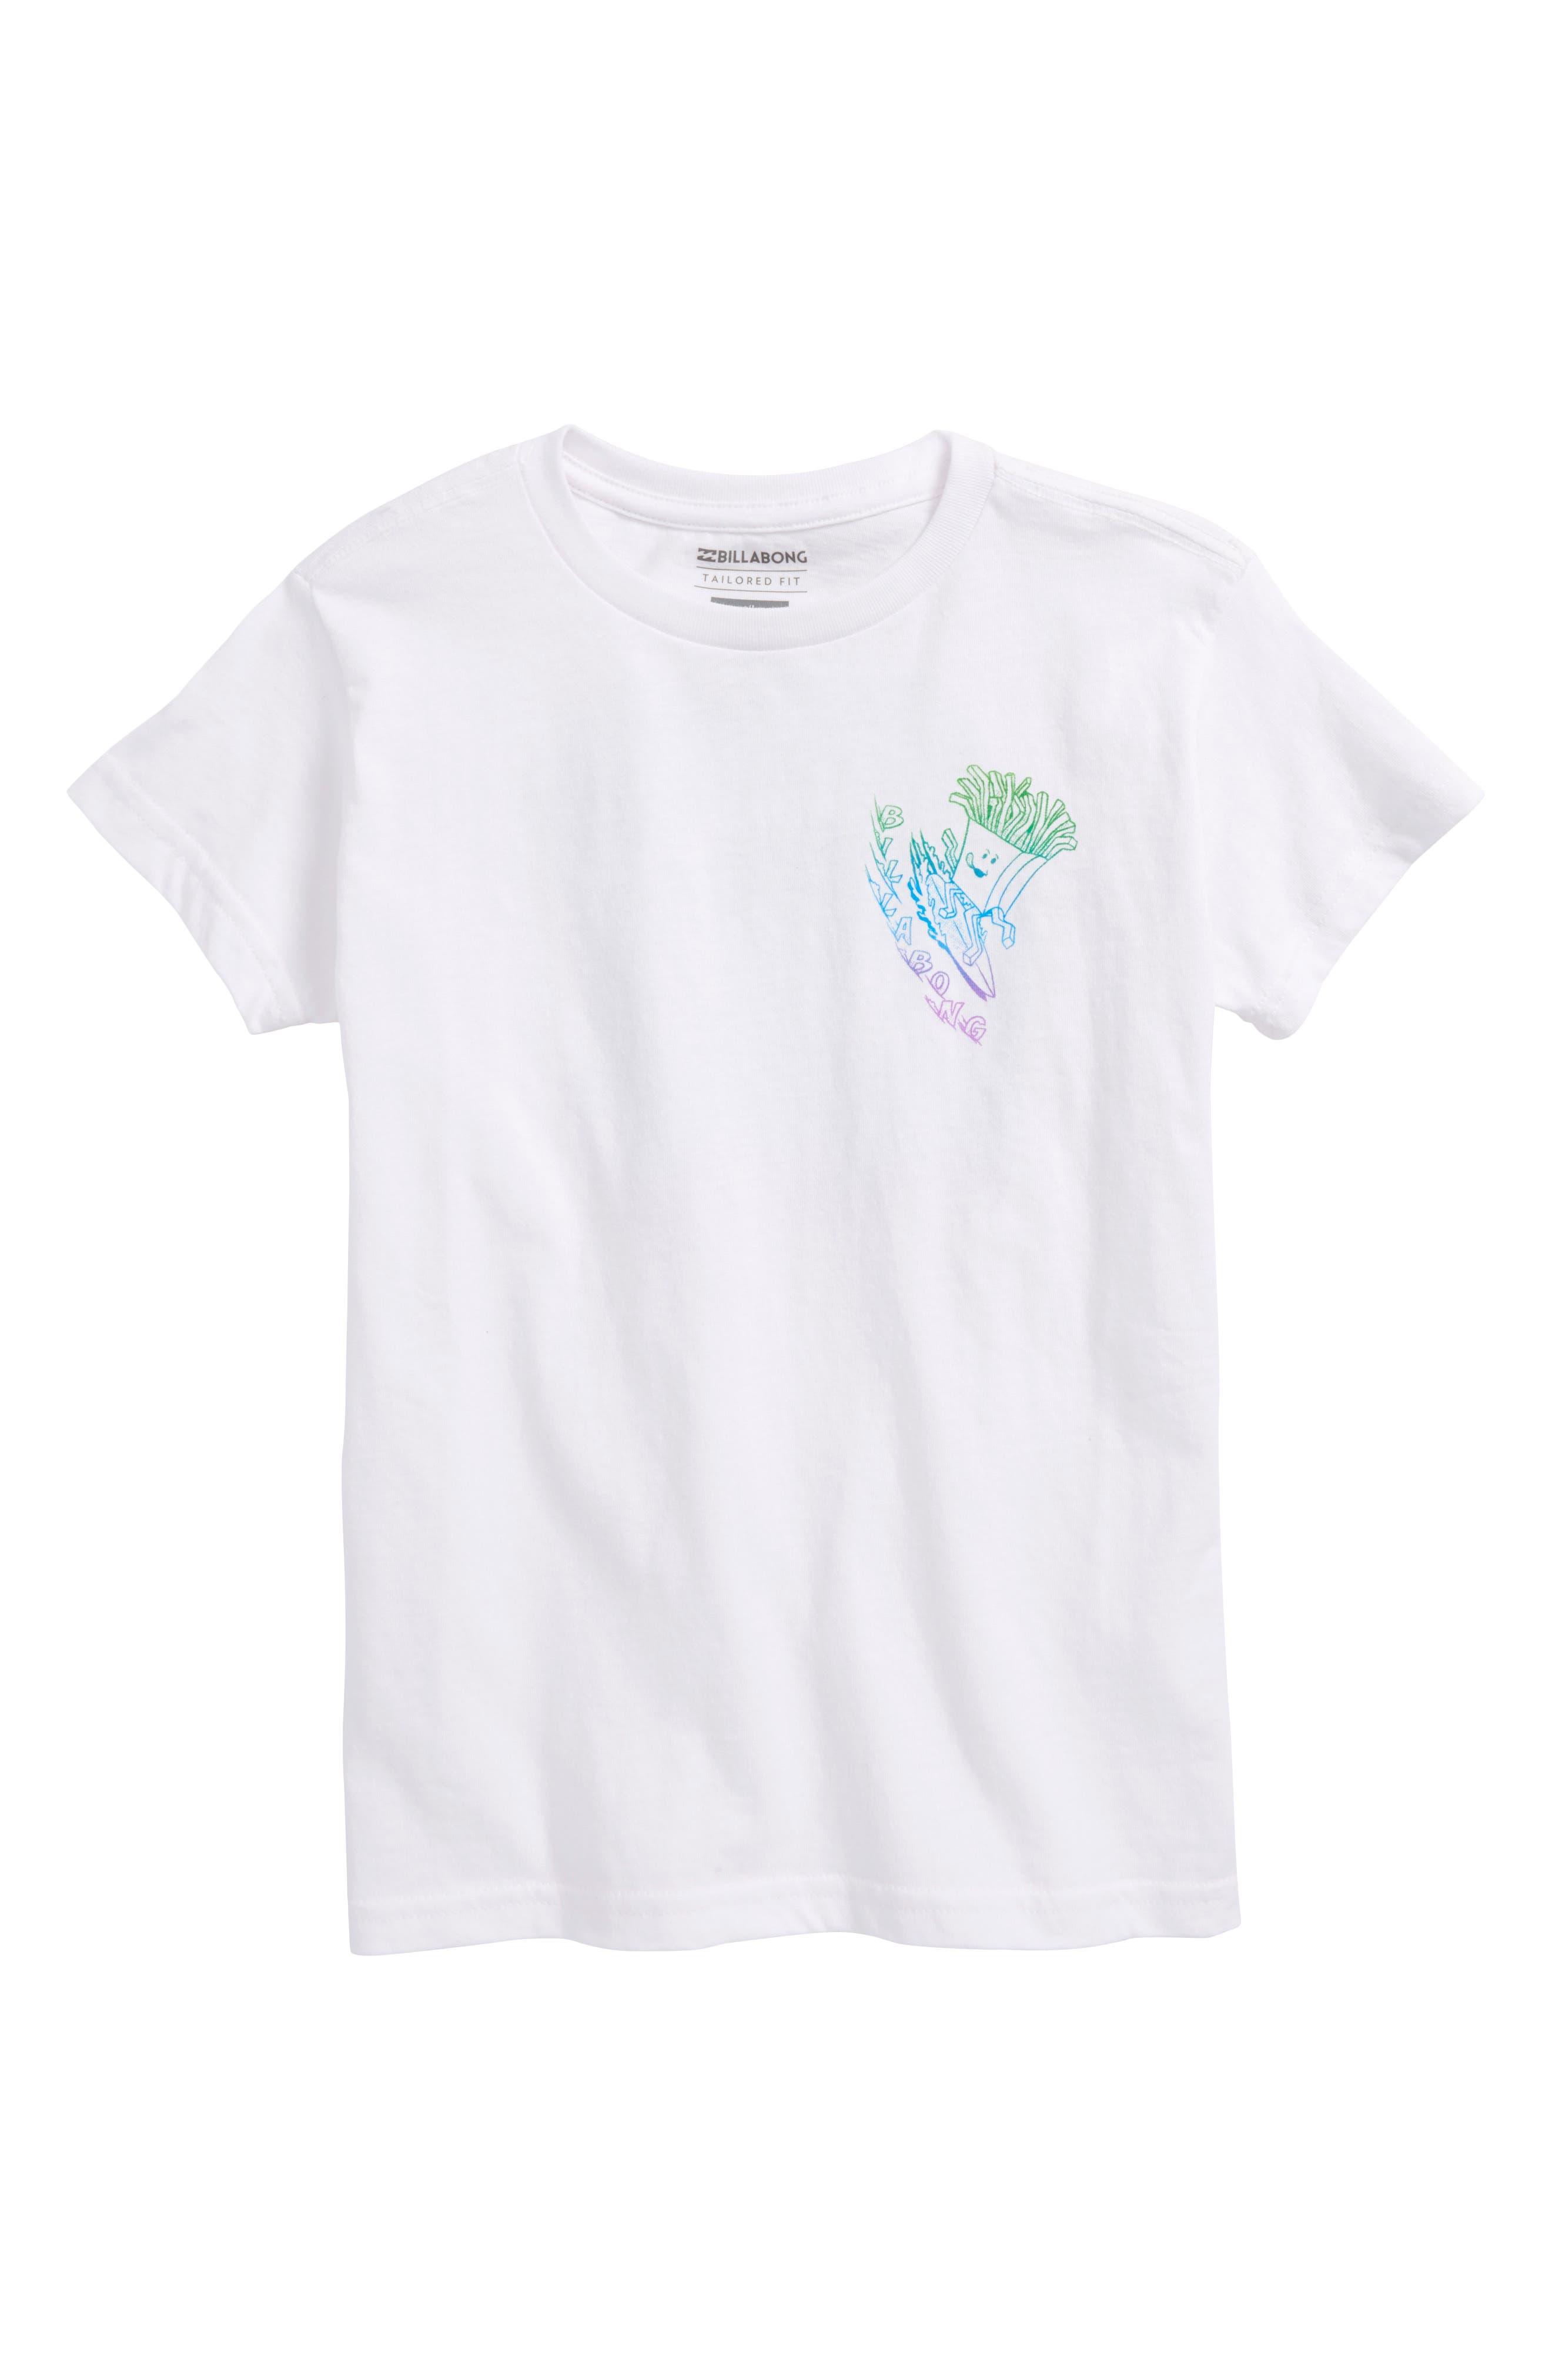 Billabong Snacks & Shacks Graphic T-Shirt (Little Boys)